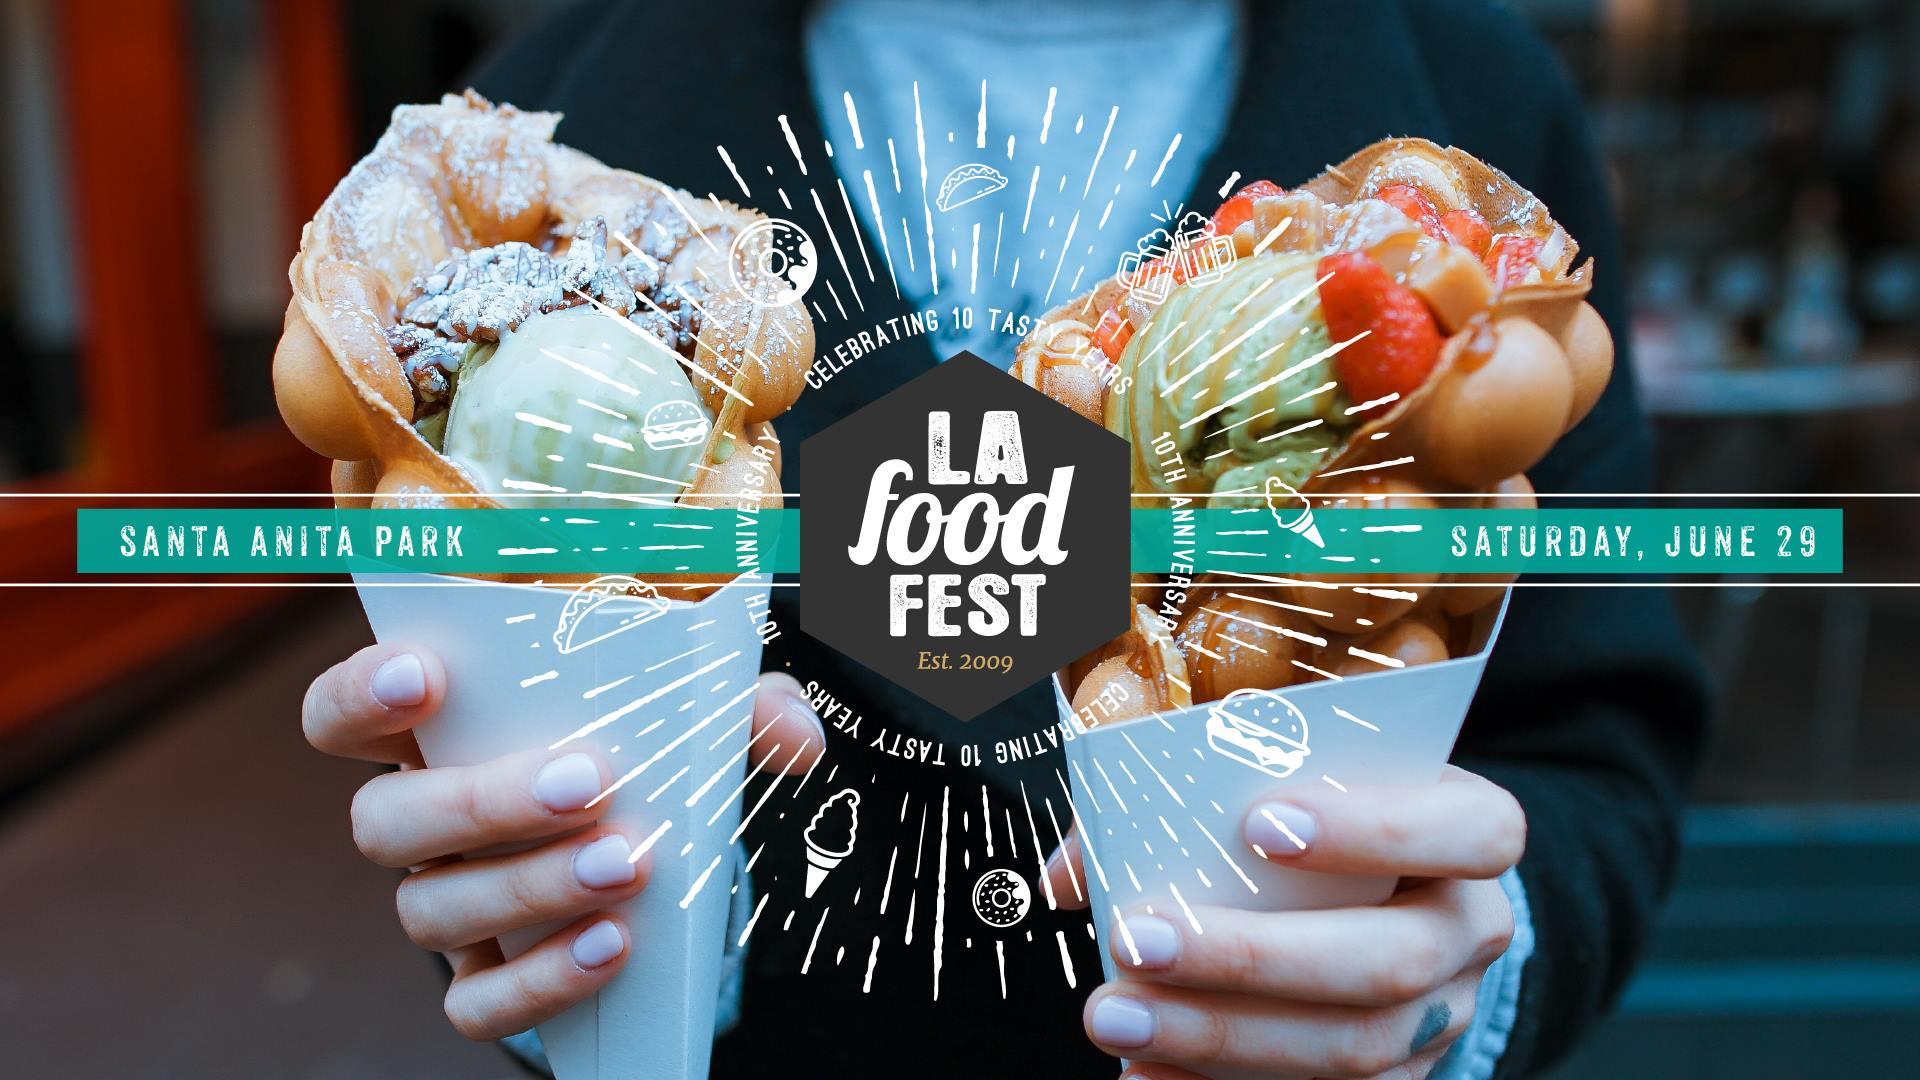 10th Annual L.A. Food Fest